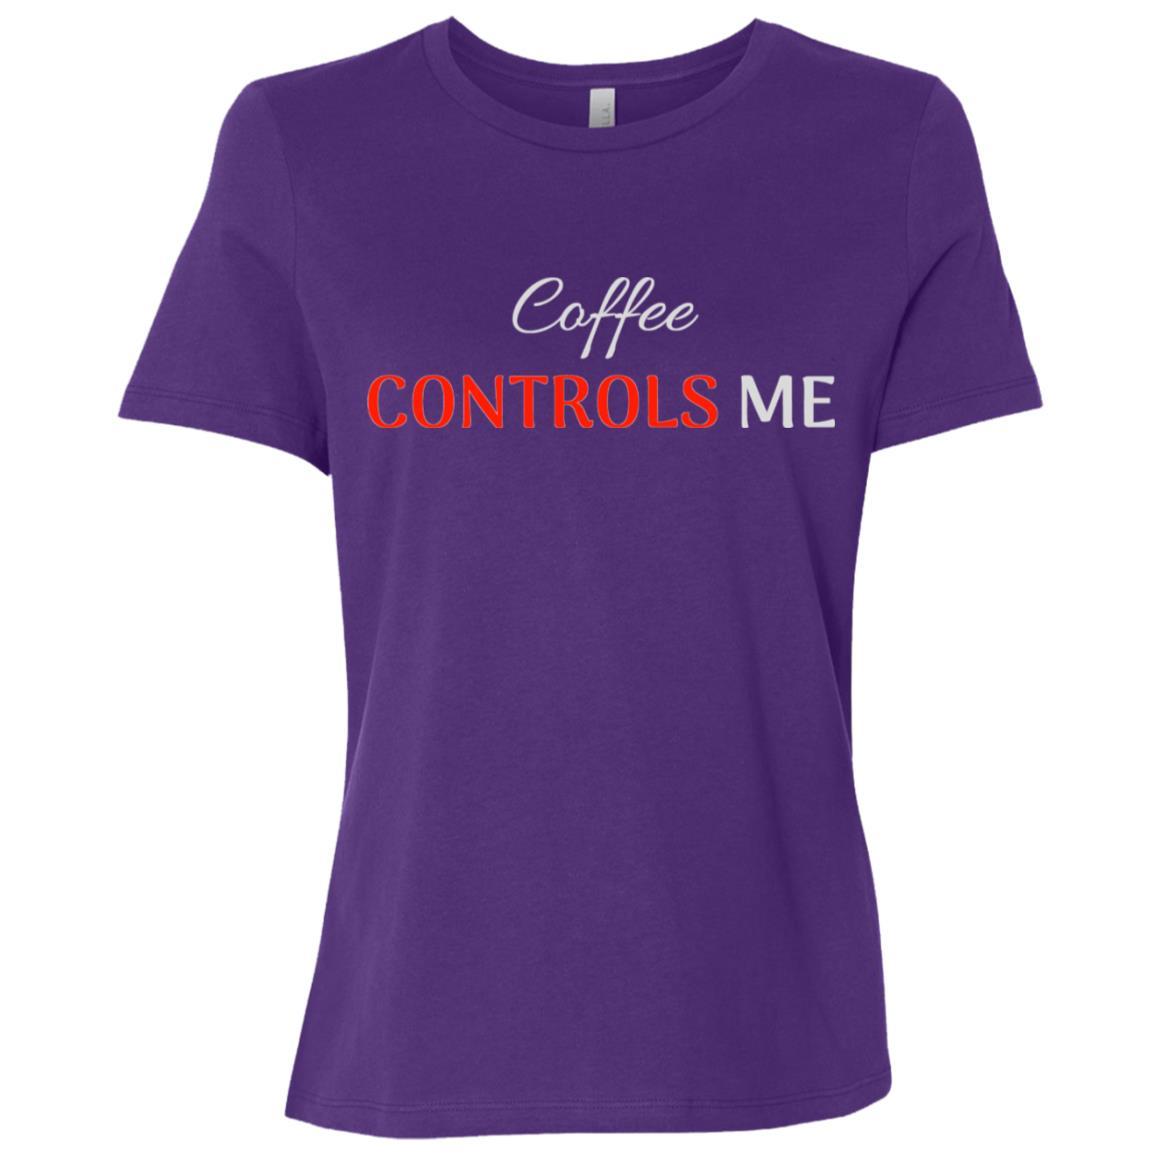 Coffee Controls Me Women Short Sleeve T-Shirt